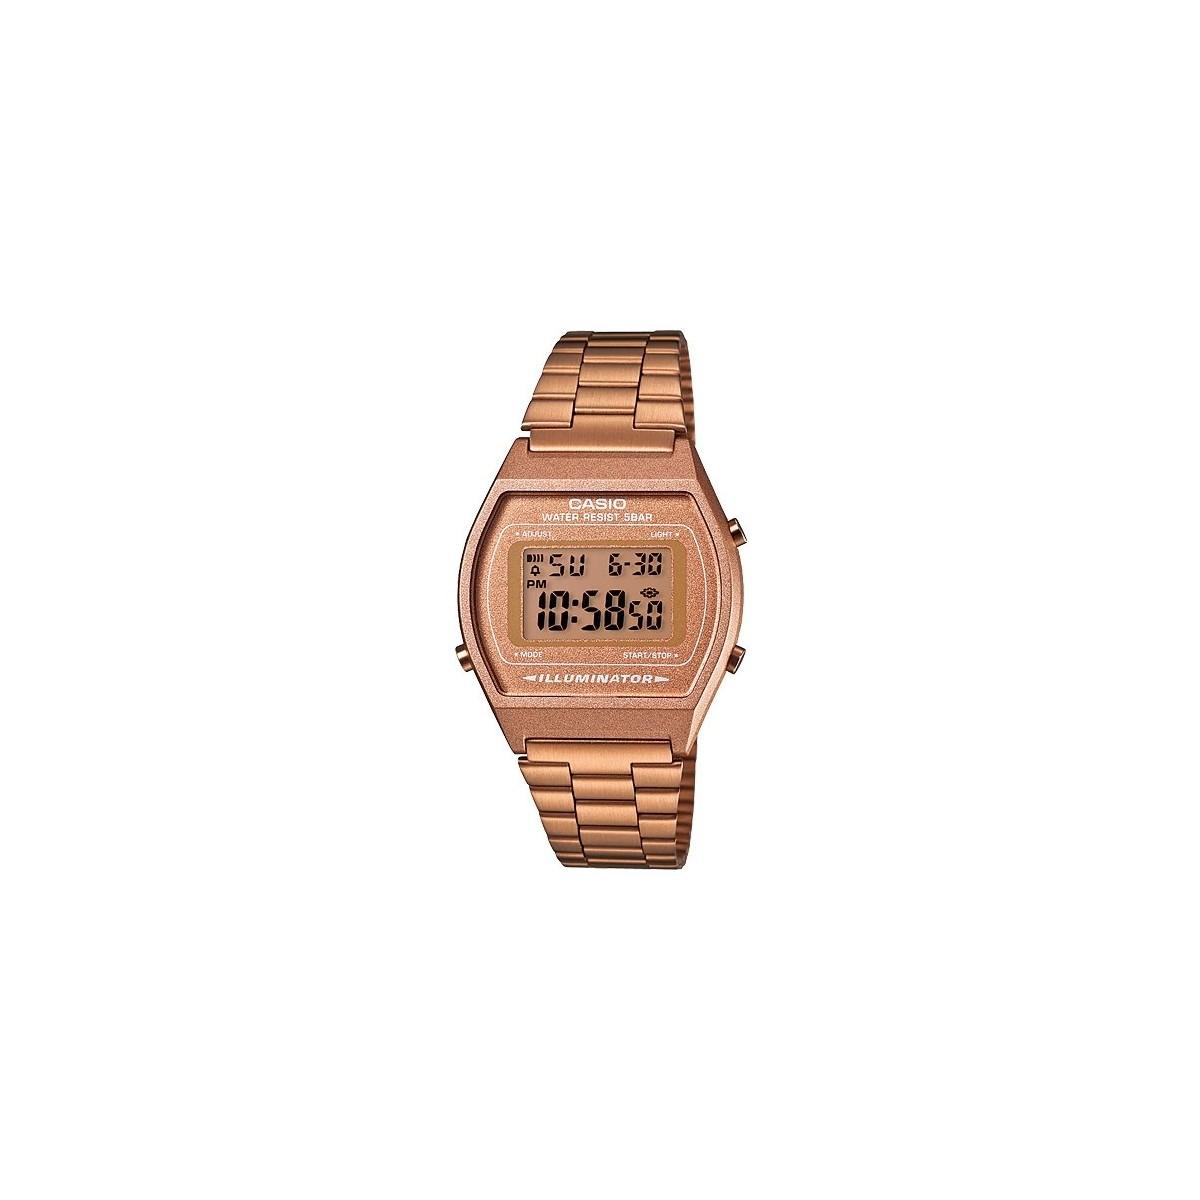 https://www.gaberjoyeria.com/4911-thickbox_default/reloj-casio-retro.jpg